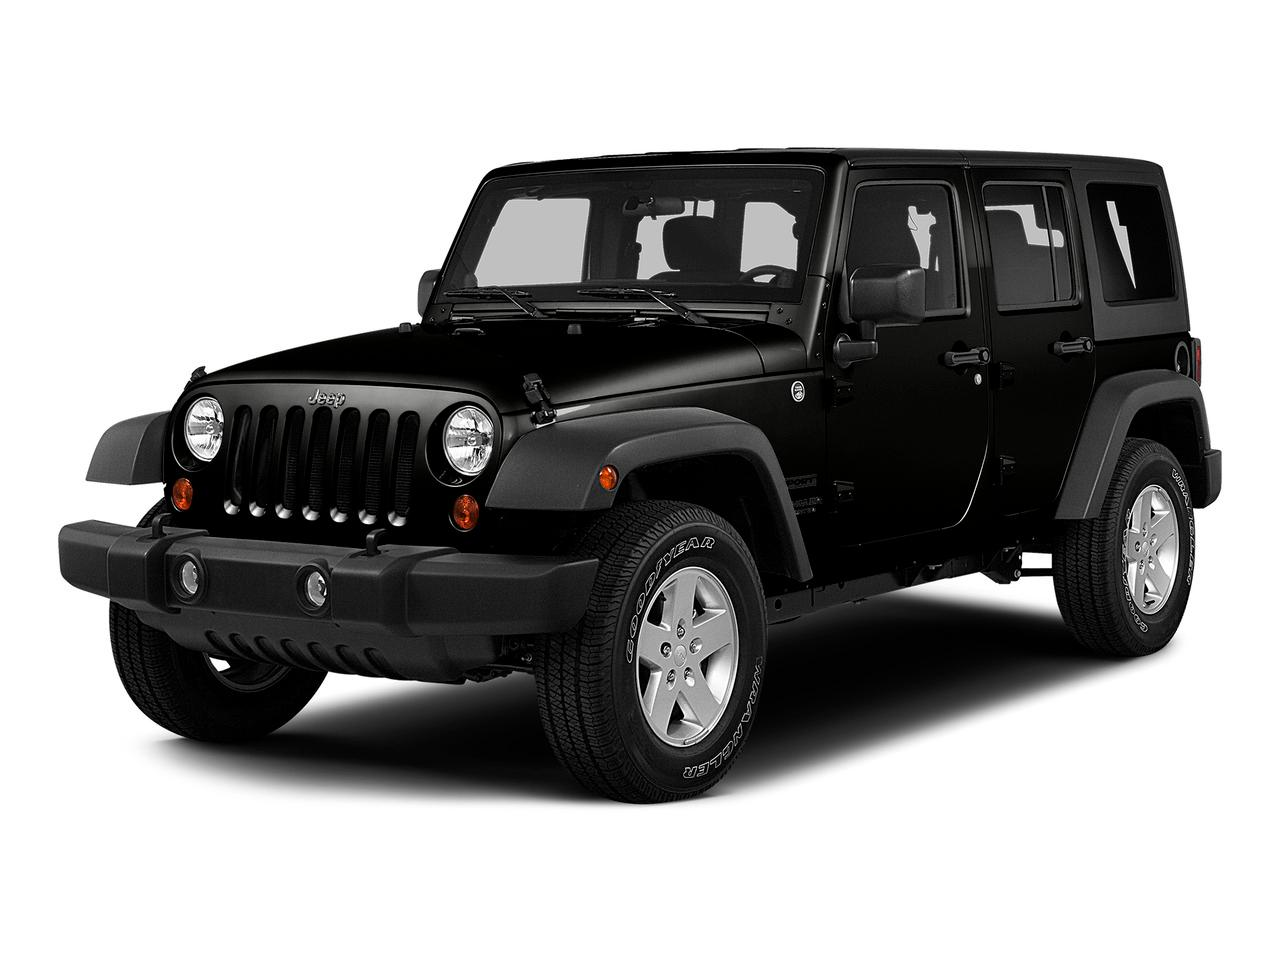 2015 Jeep Wrangler Unlimited Vehicle Photo in BATON ROUGE, LA 70806-4464